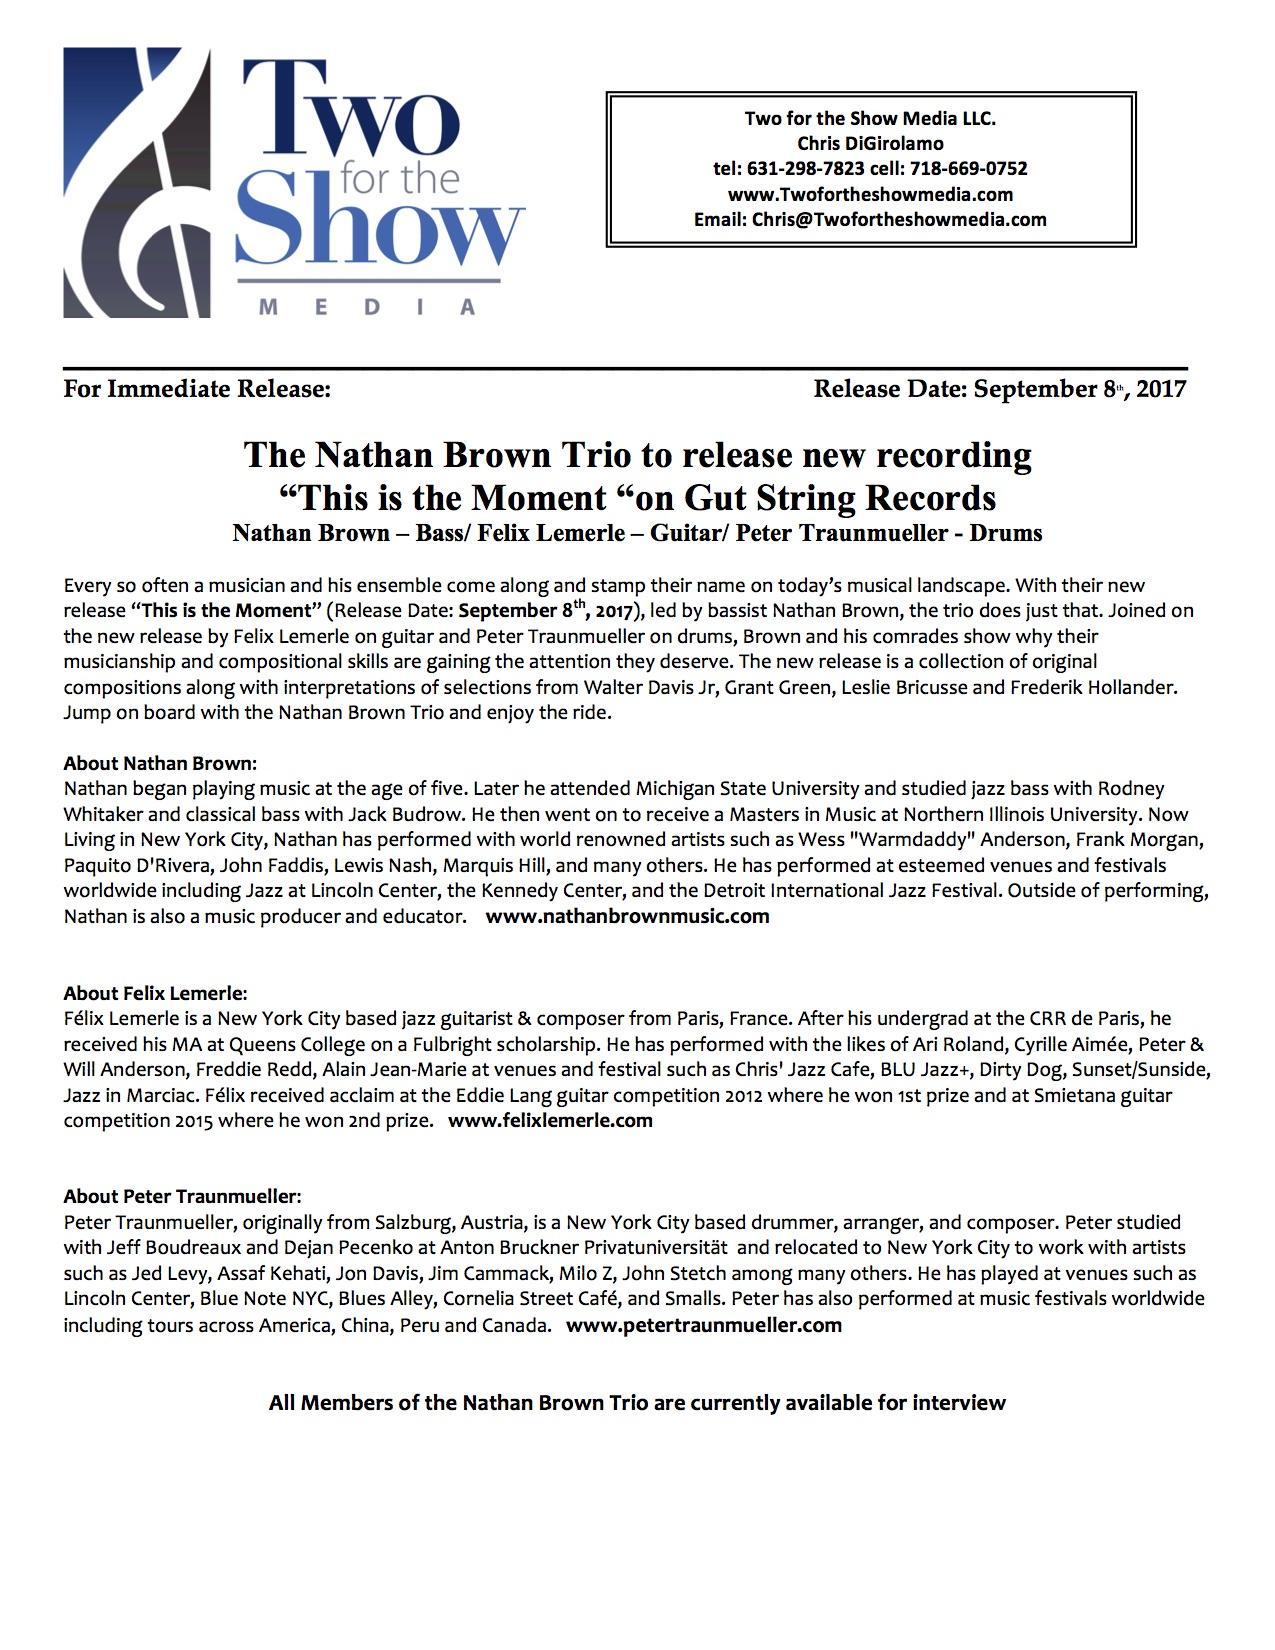 Nathan Brown Trio Press Sheet.jpg